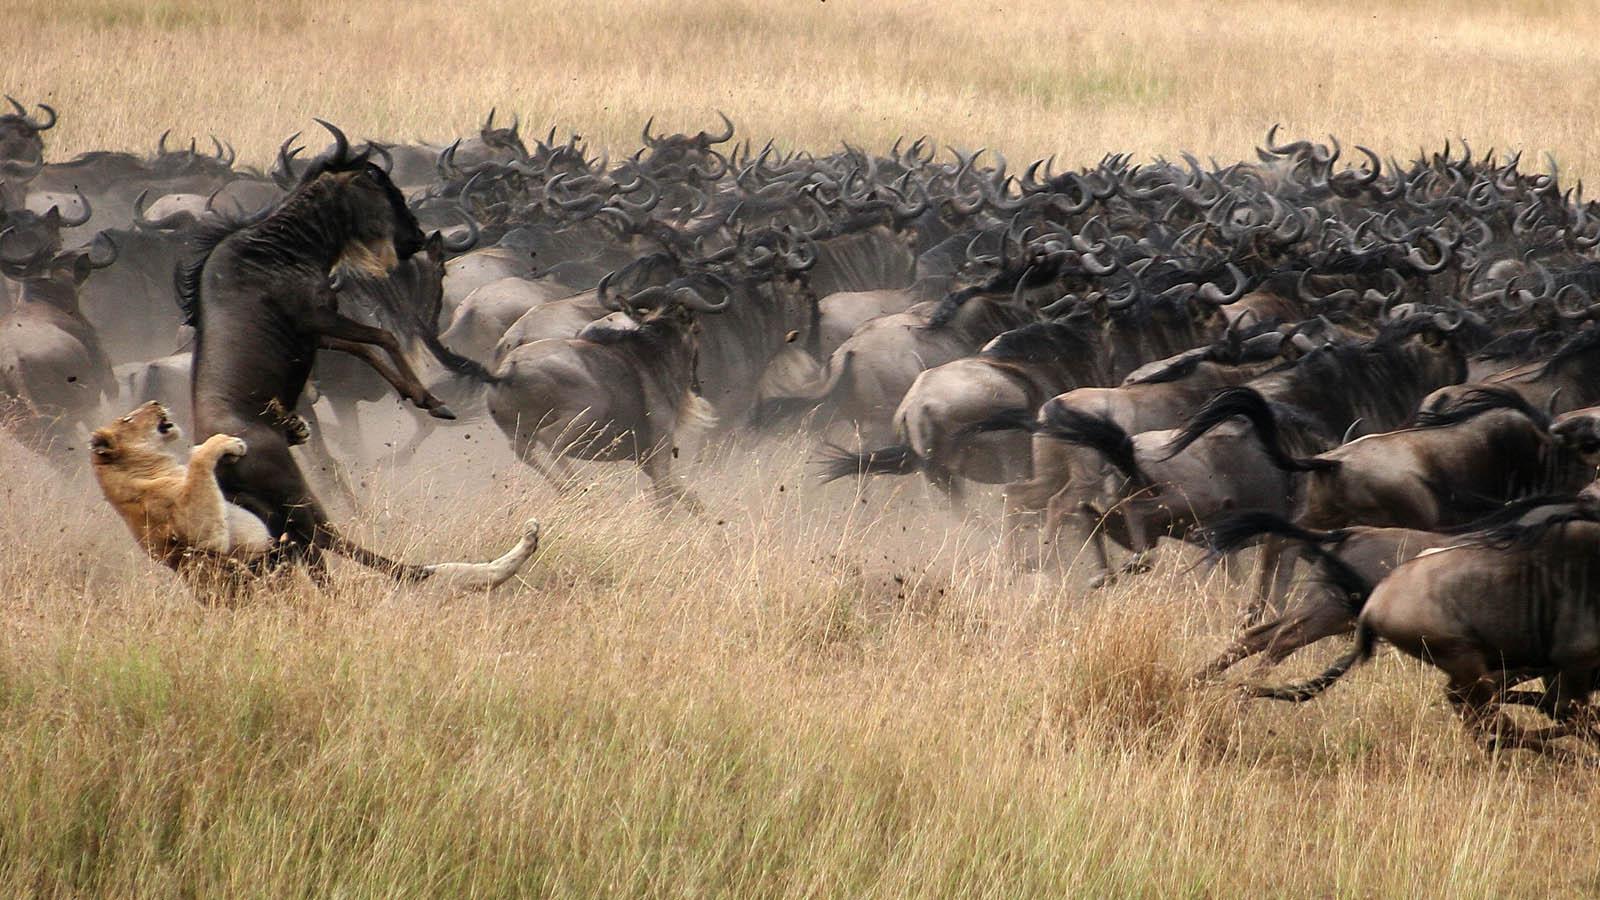 The Great wildebeest migration 8